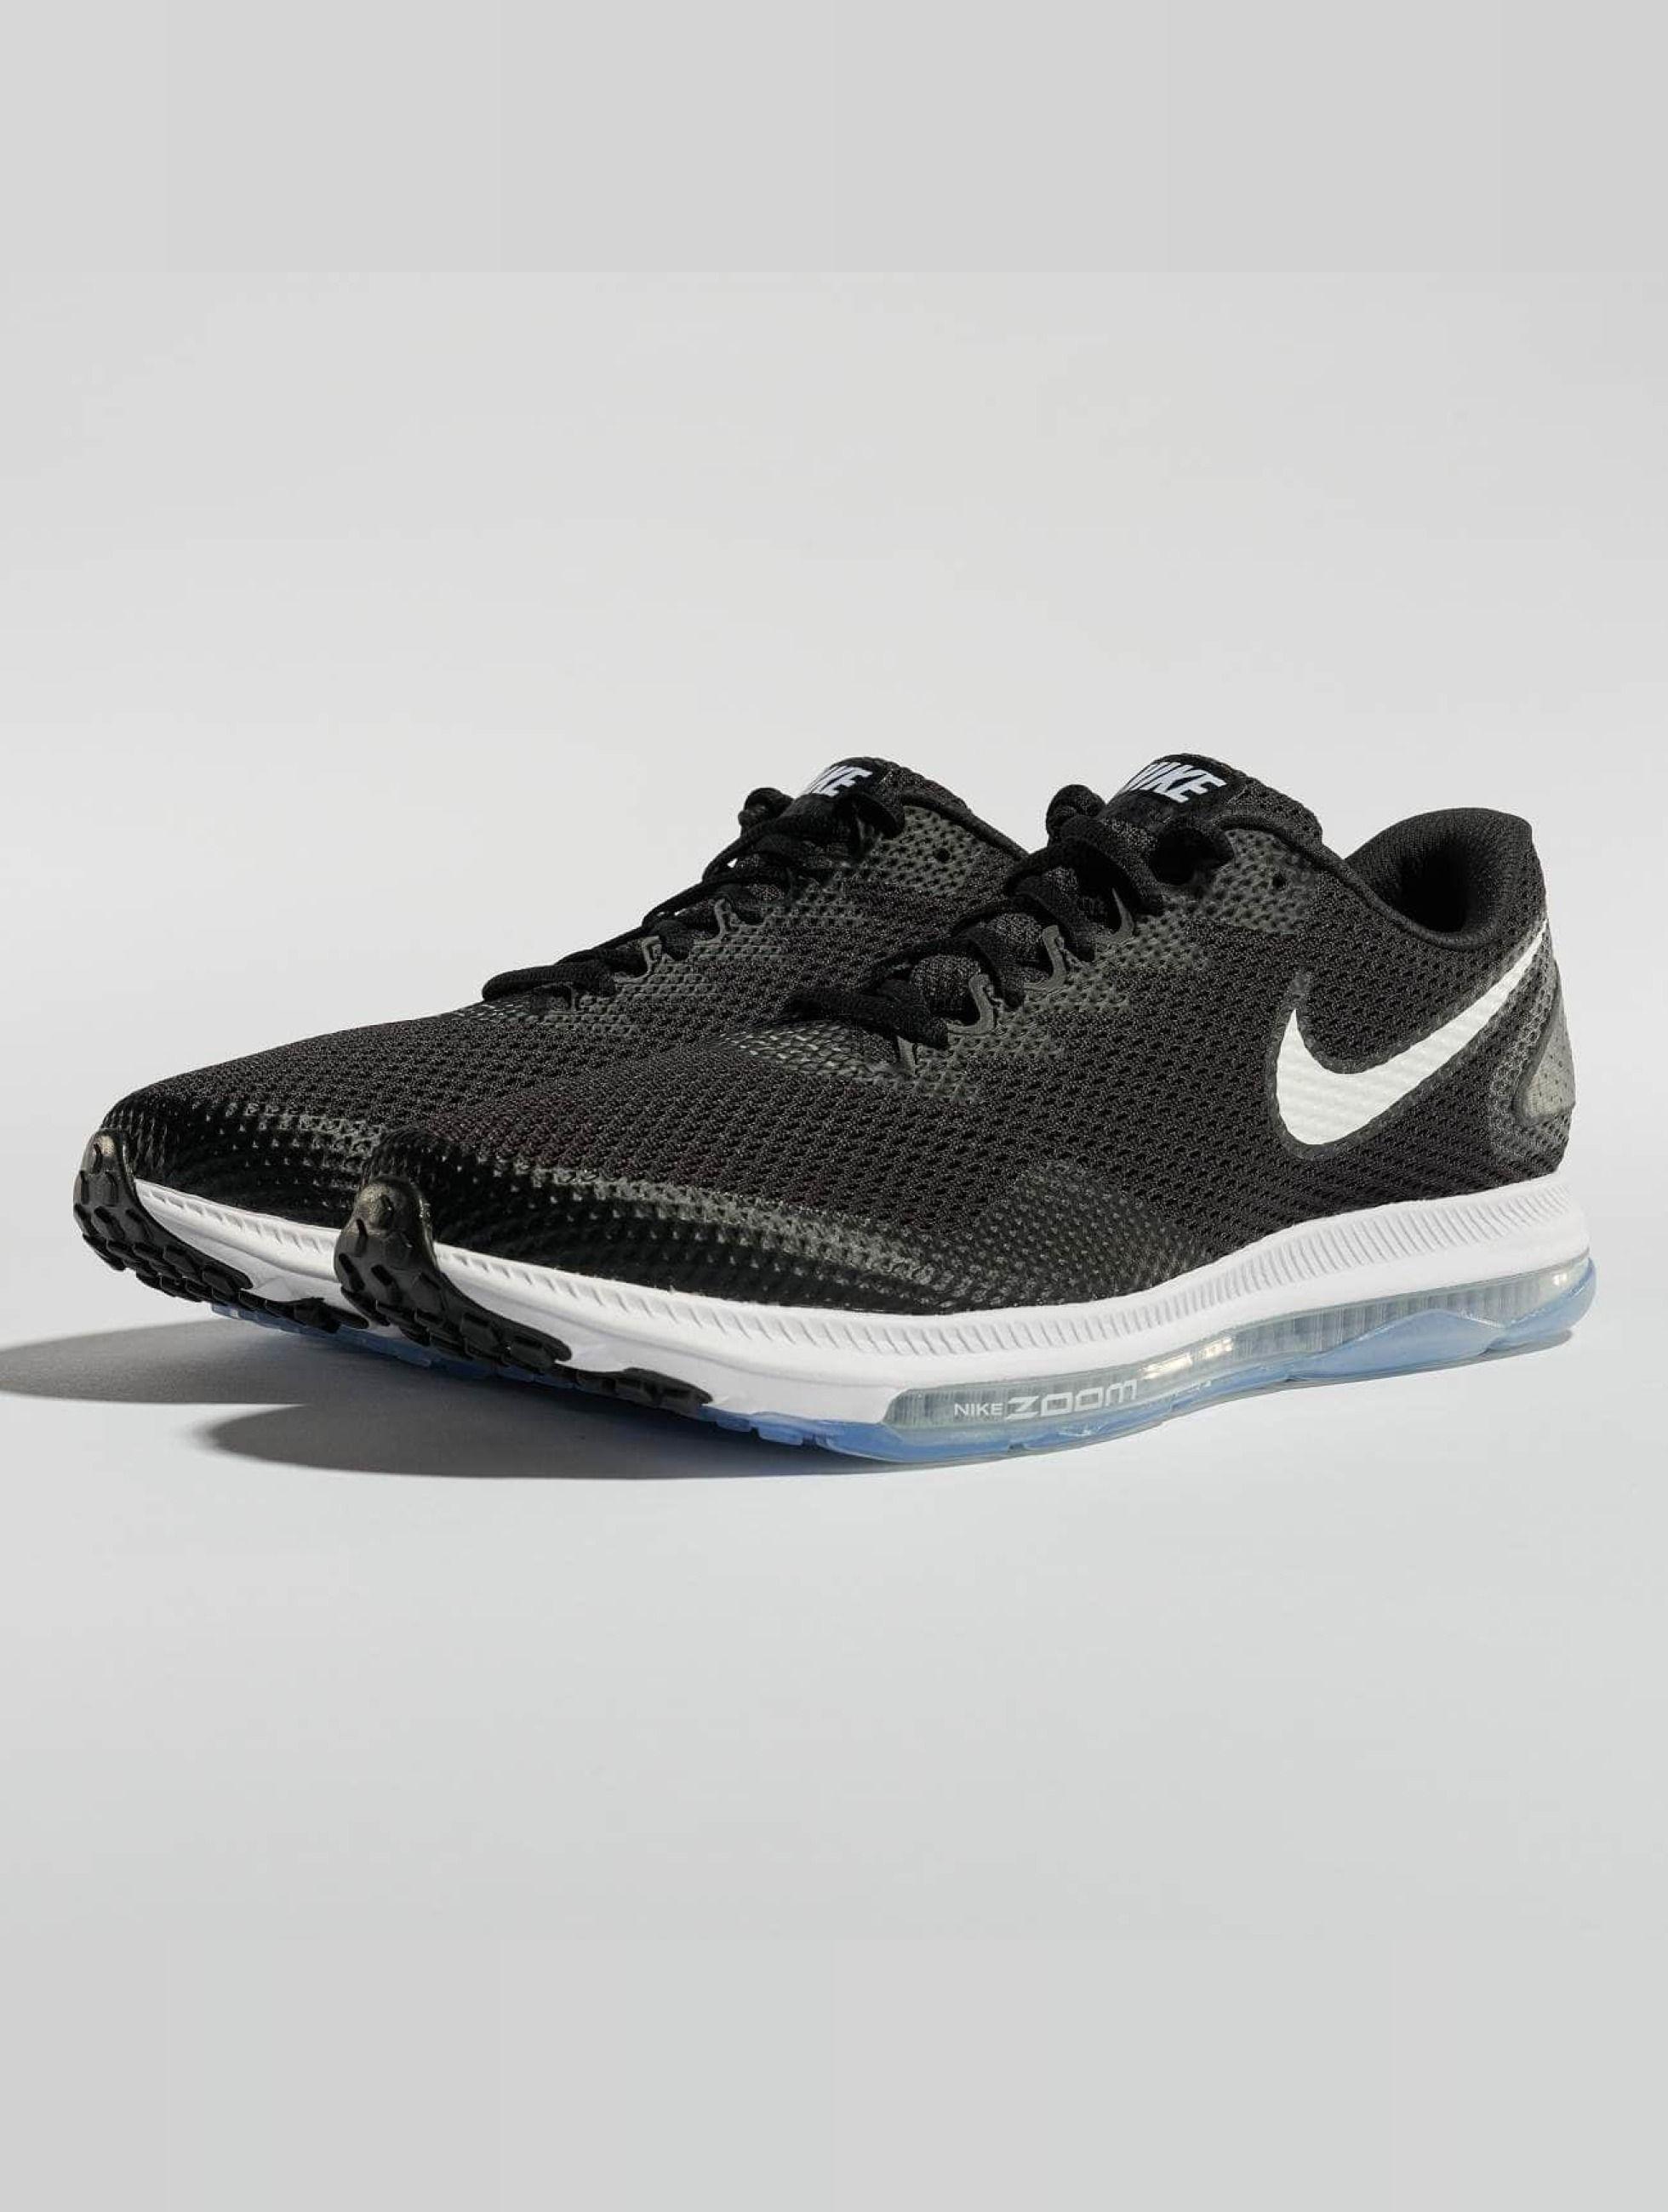 Nike Air Max online be DefShop bestellen